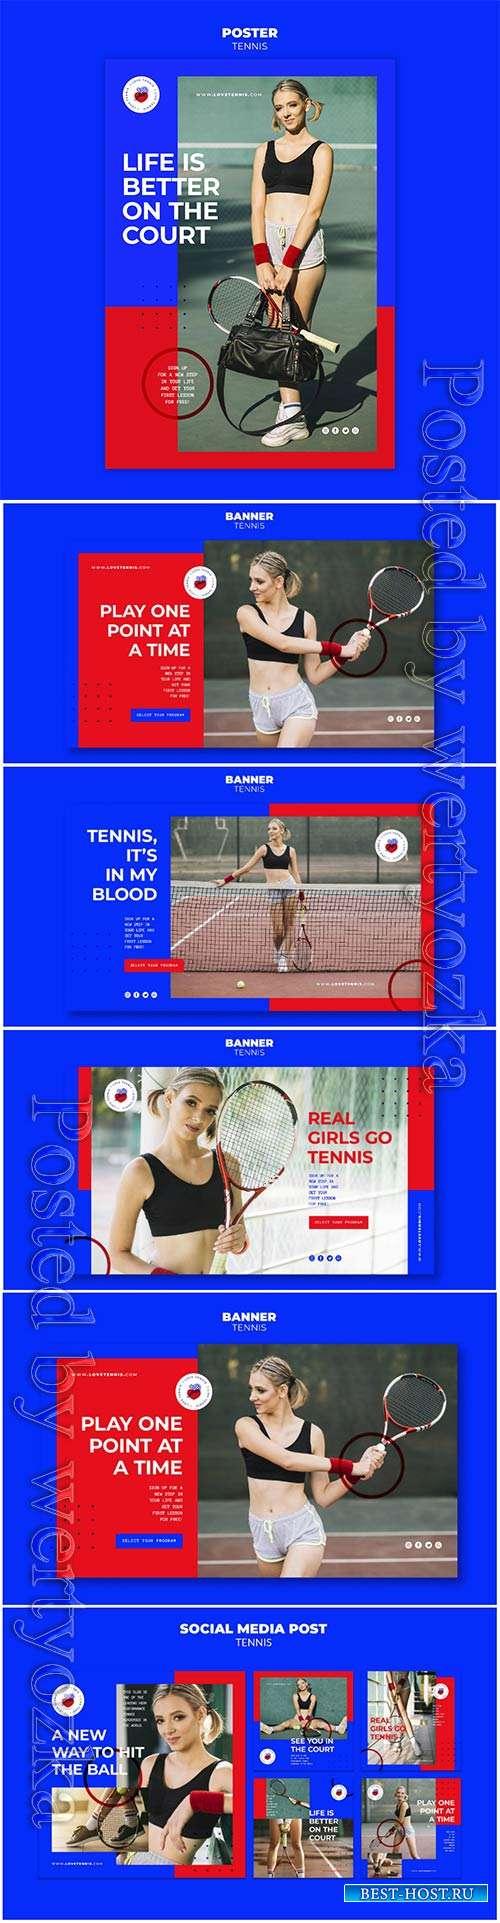 Tennis concept banner template